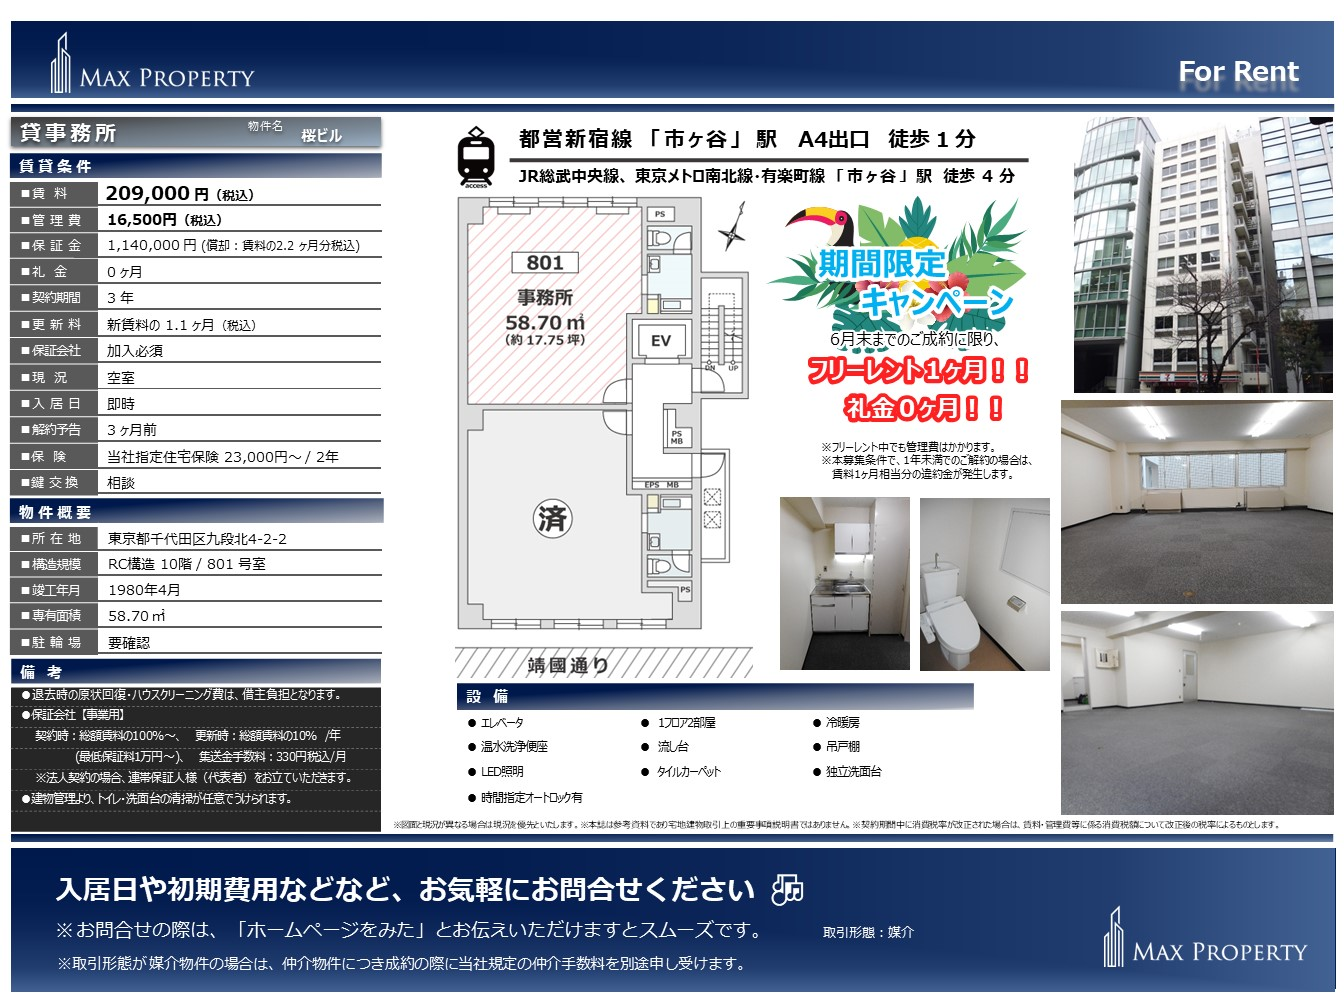 HP_桜ビル801_賃貸_20210607